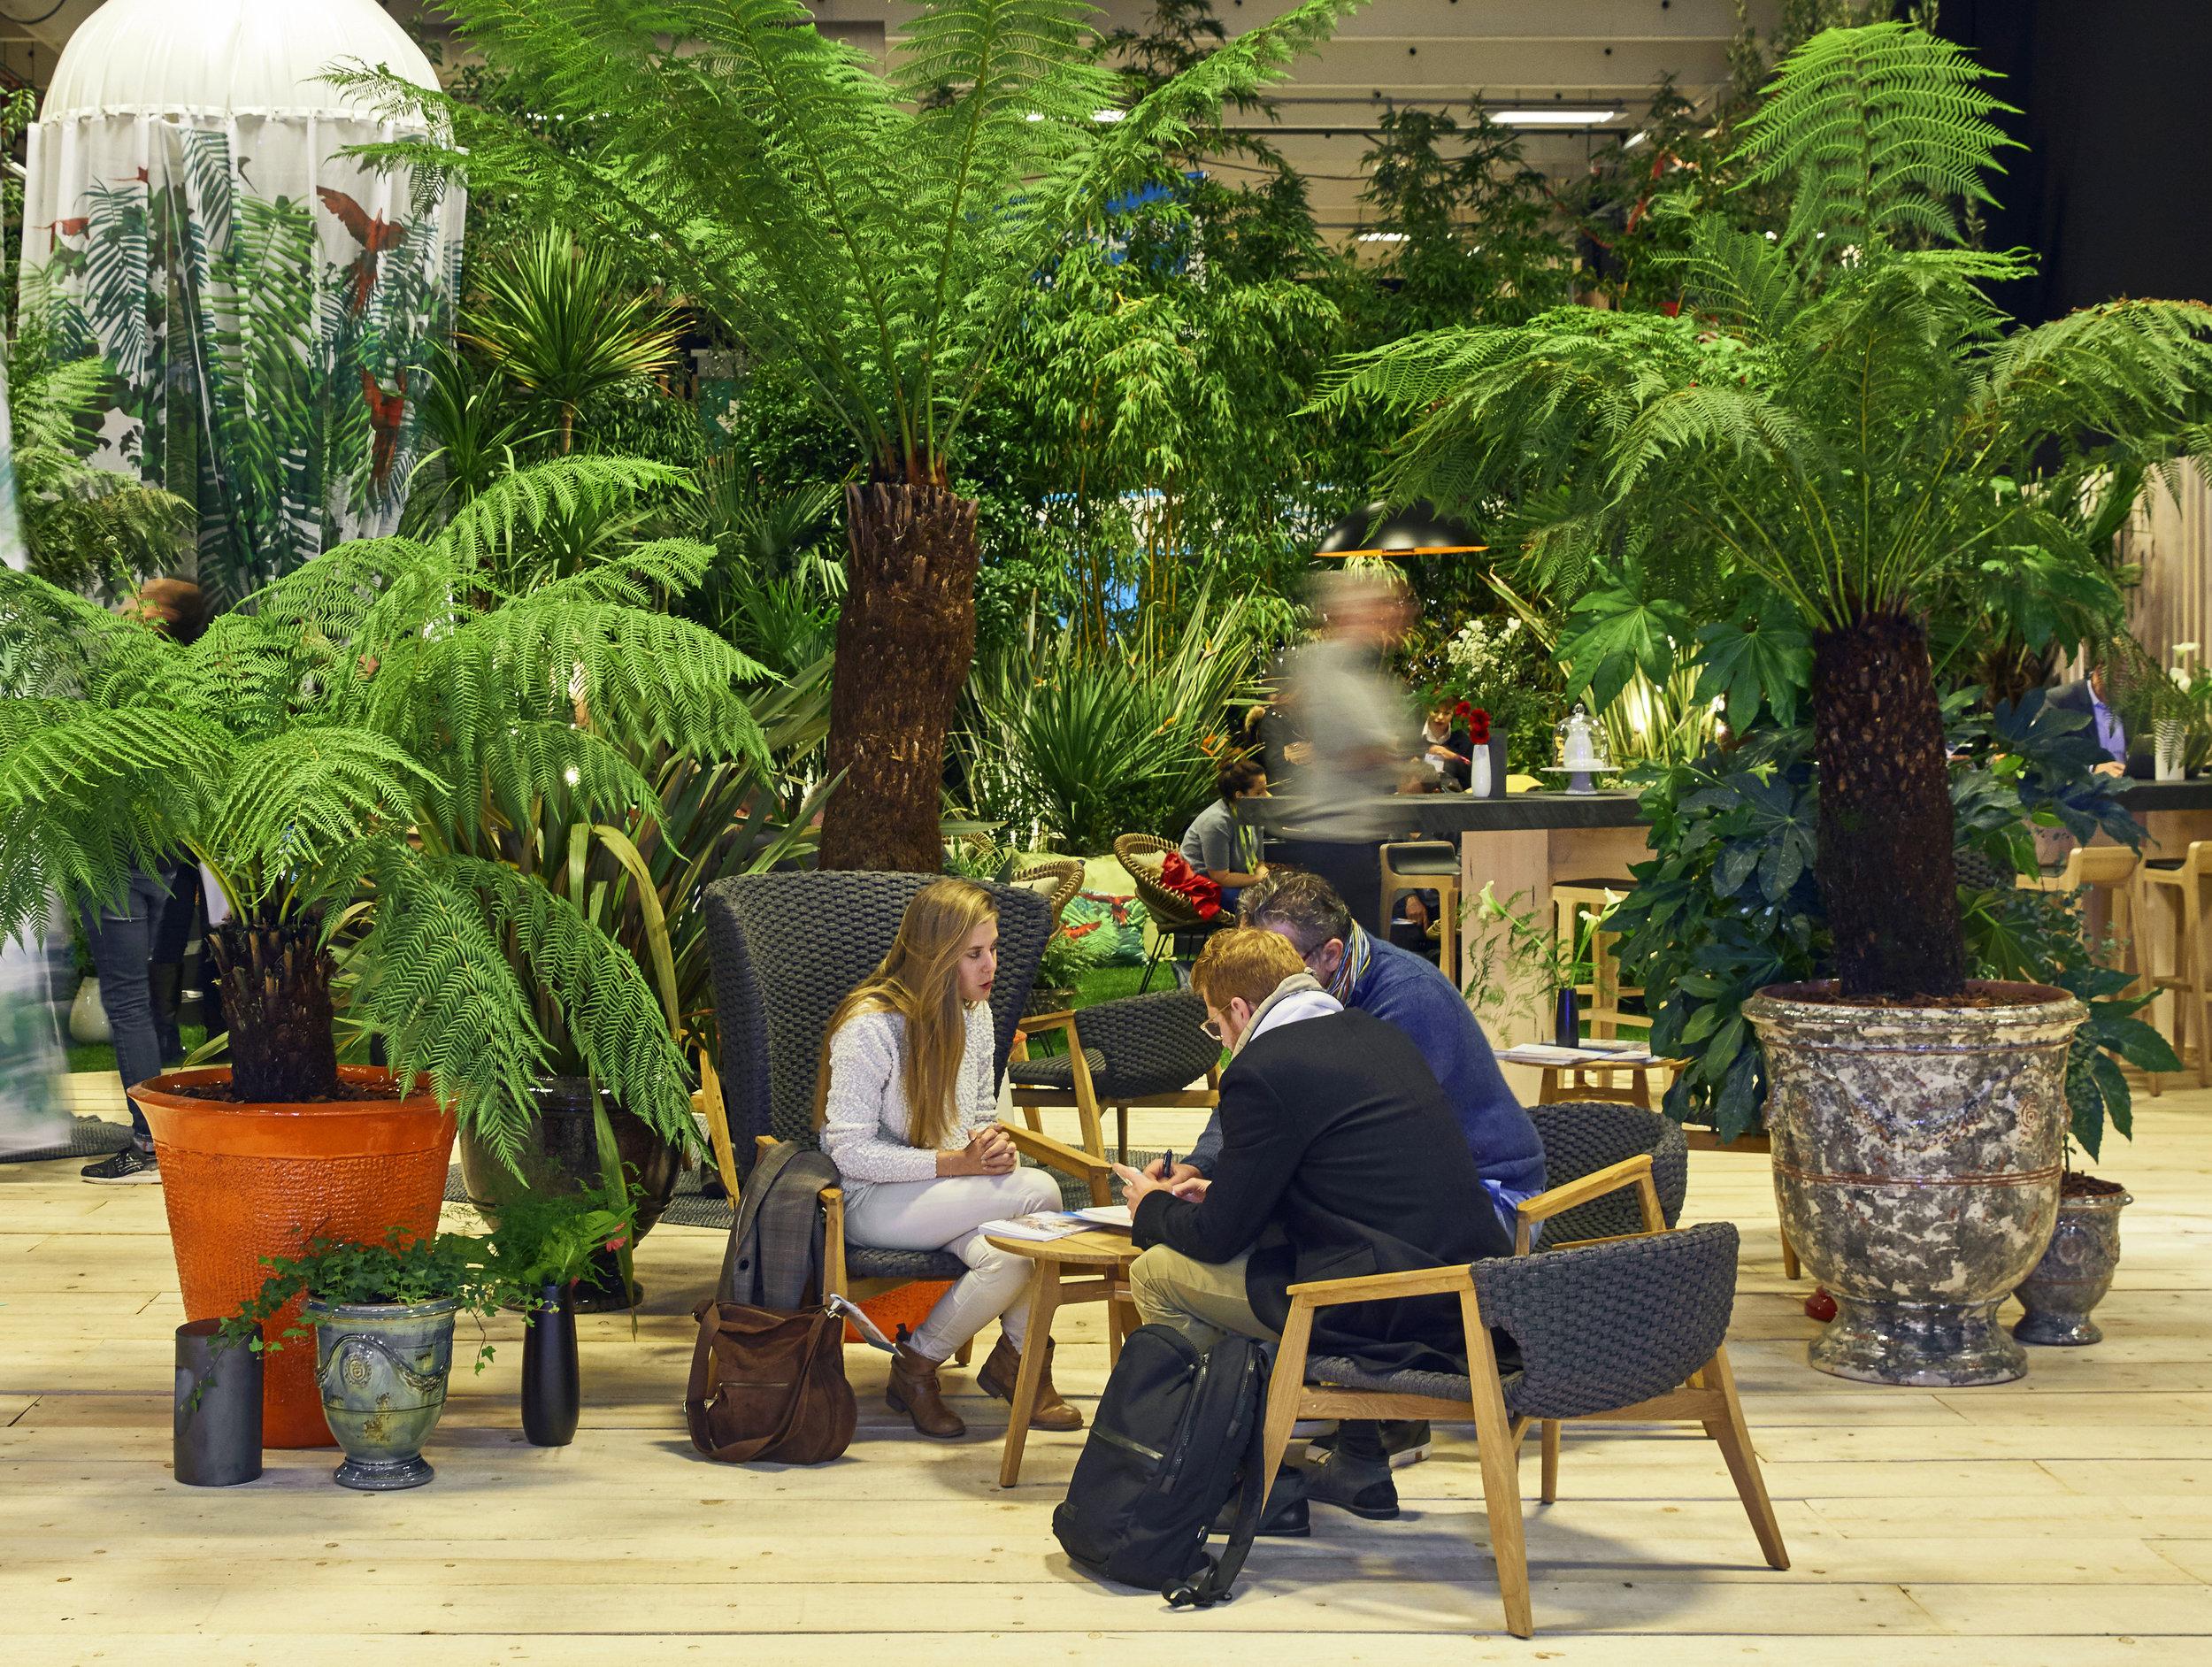 tradeshow_equiphotel_paris_terraces_gardens_christophe_gautrand_landscape_outdoor_designer_5.jpg